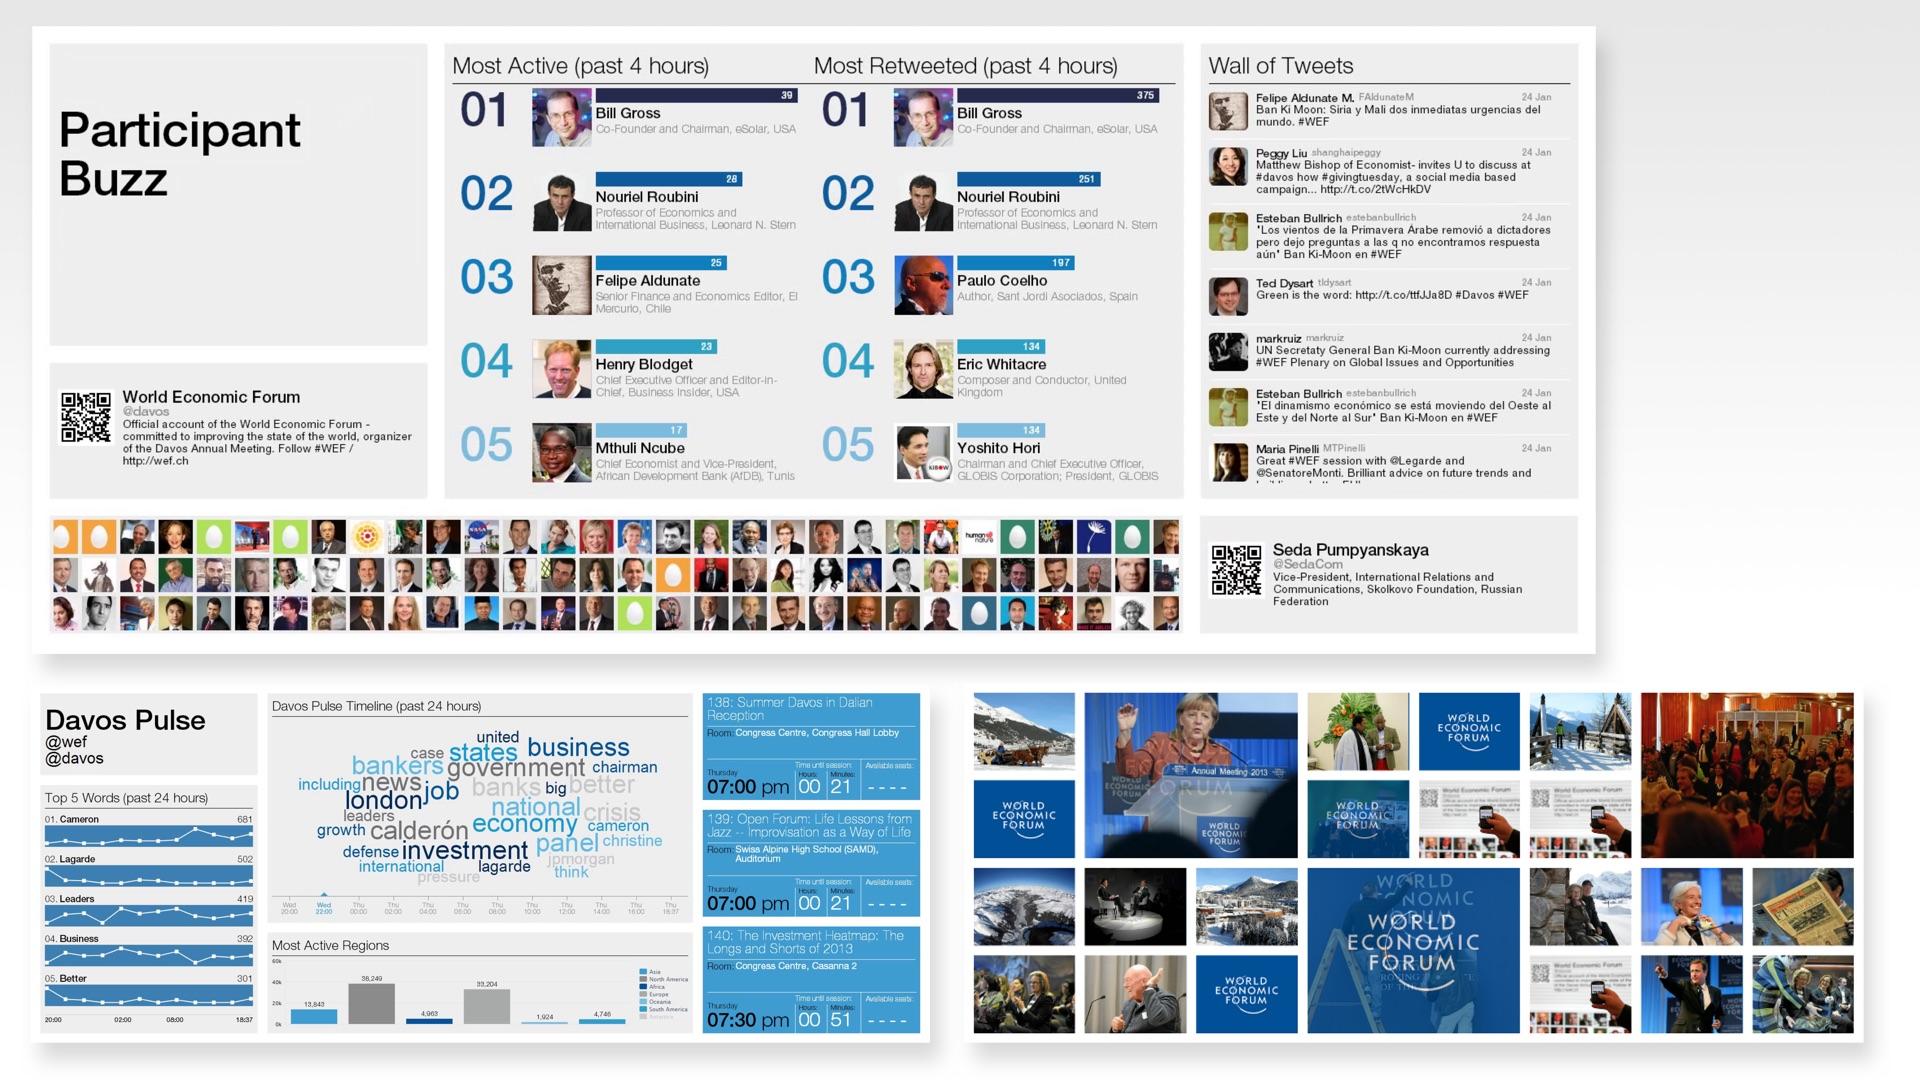 The Social Media Wall